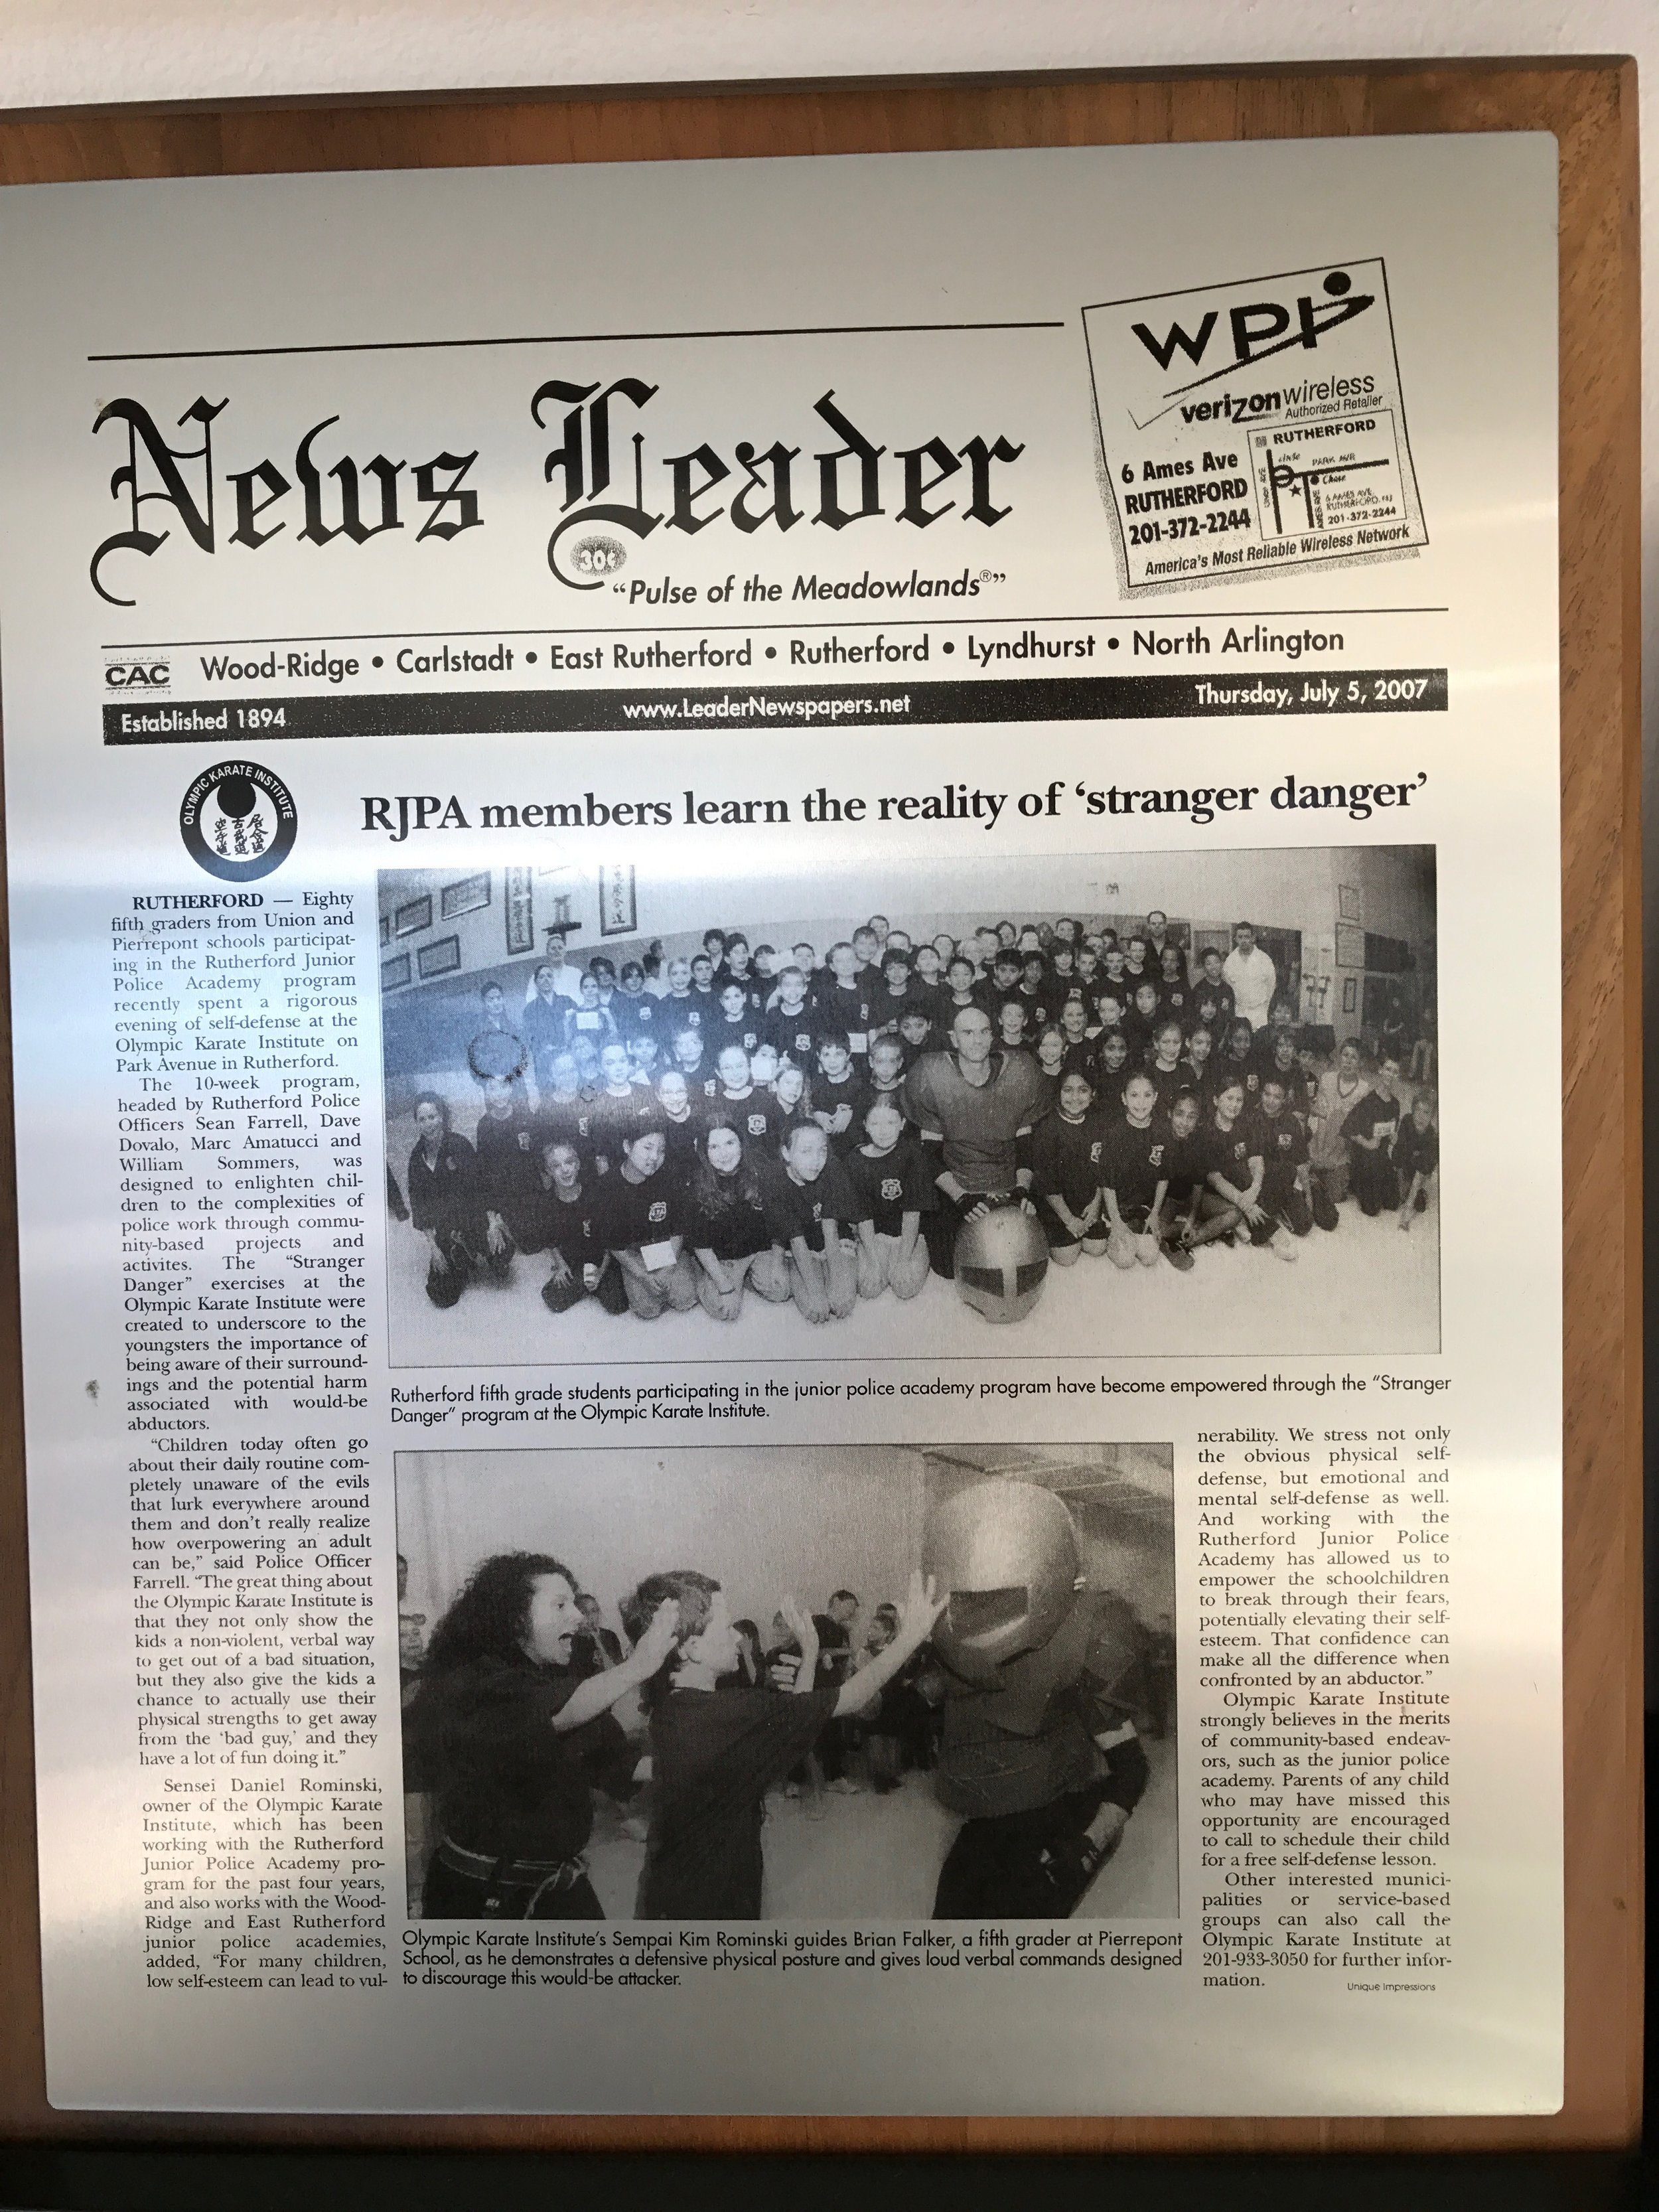 Sensei Dan Rominski TheDOJO Rutherford NJ Martial Arts Jr Police Academy Article.jpg